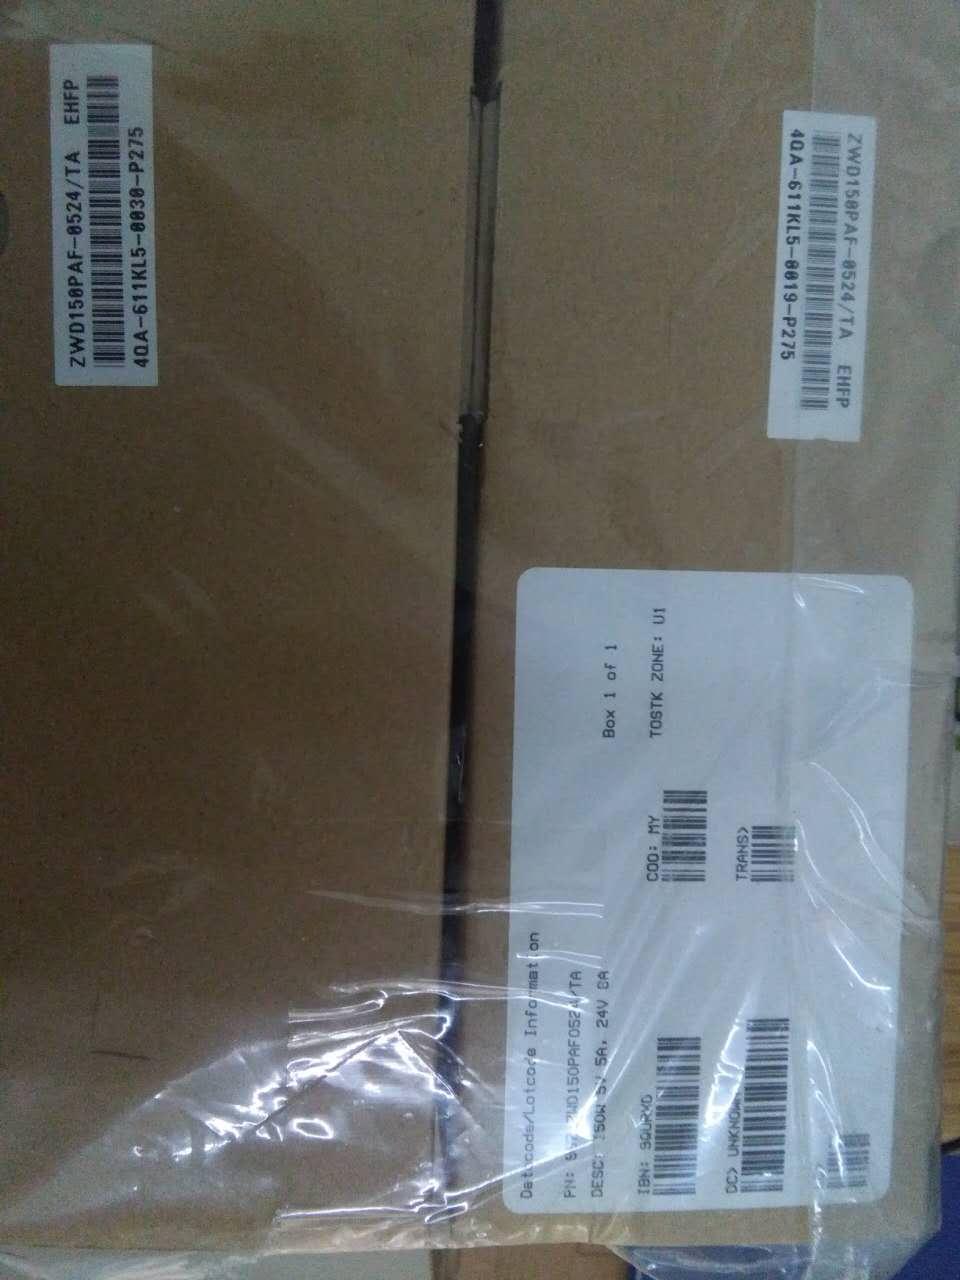 Remote 2M, SV-iG5A吉安市常年收购